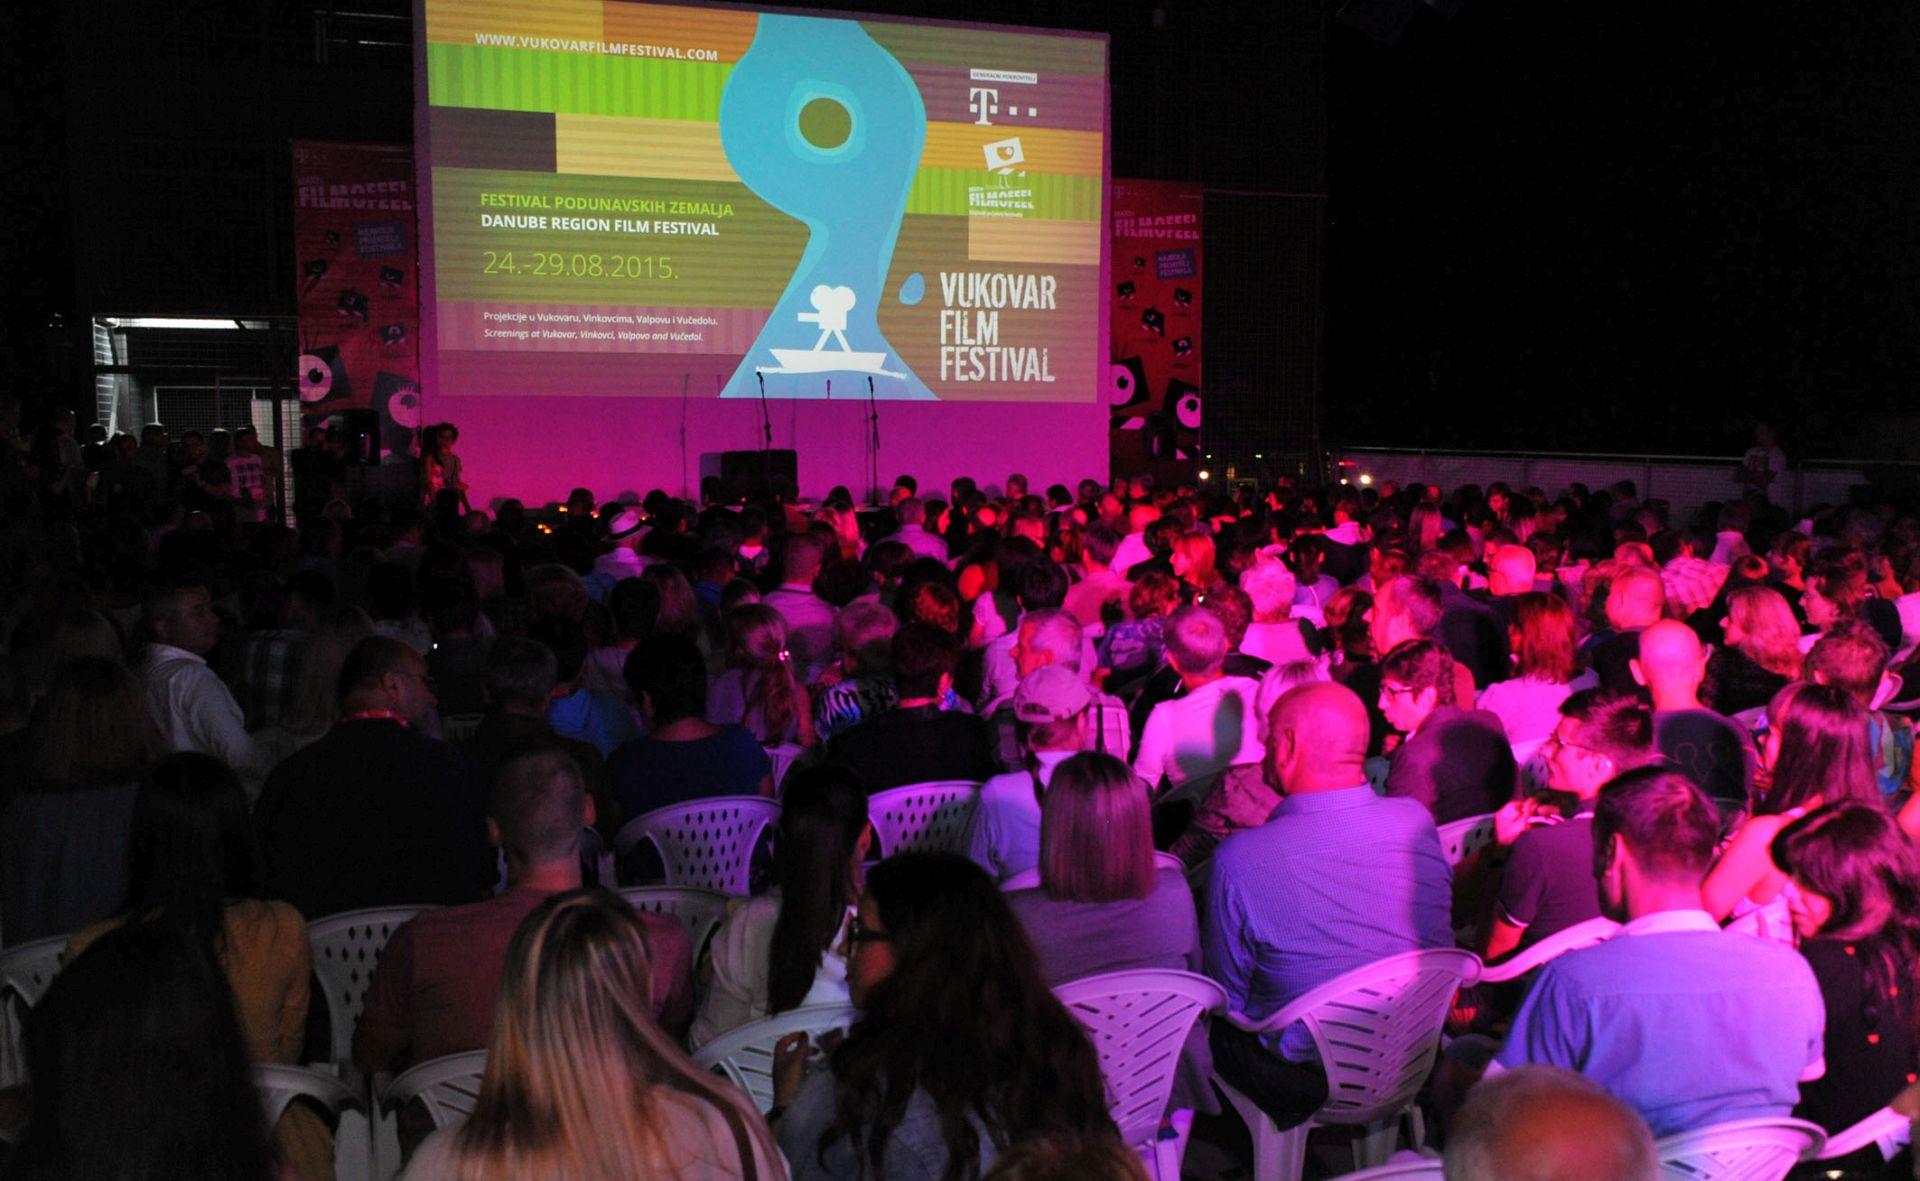 FOTO: Otvoren 9. Vukovar film festival